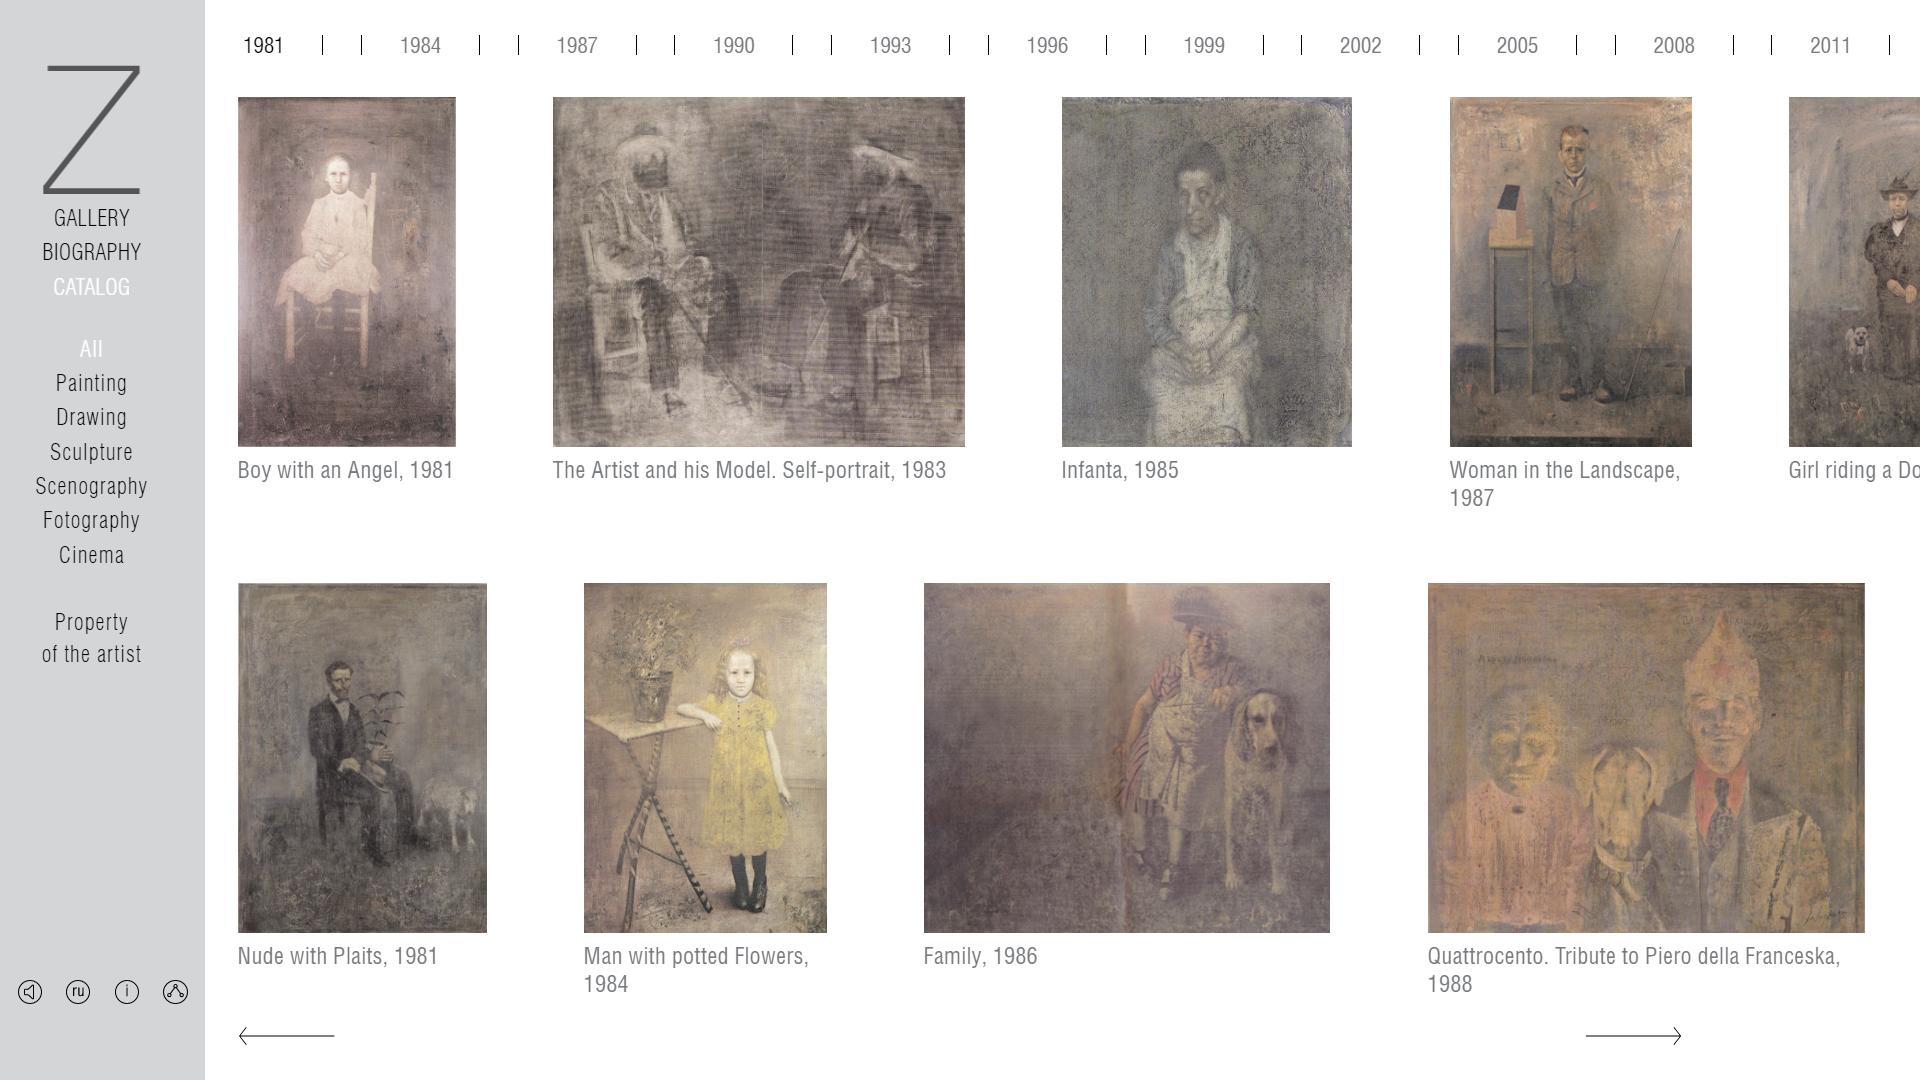 The personal website of the artist Boris Zaborov